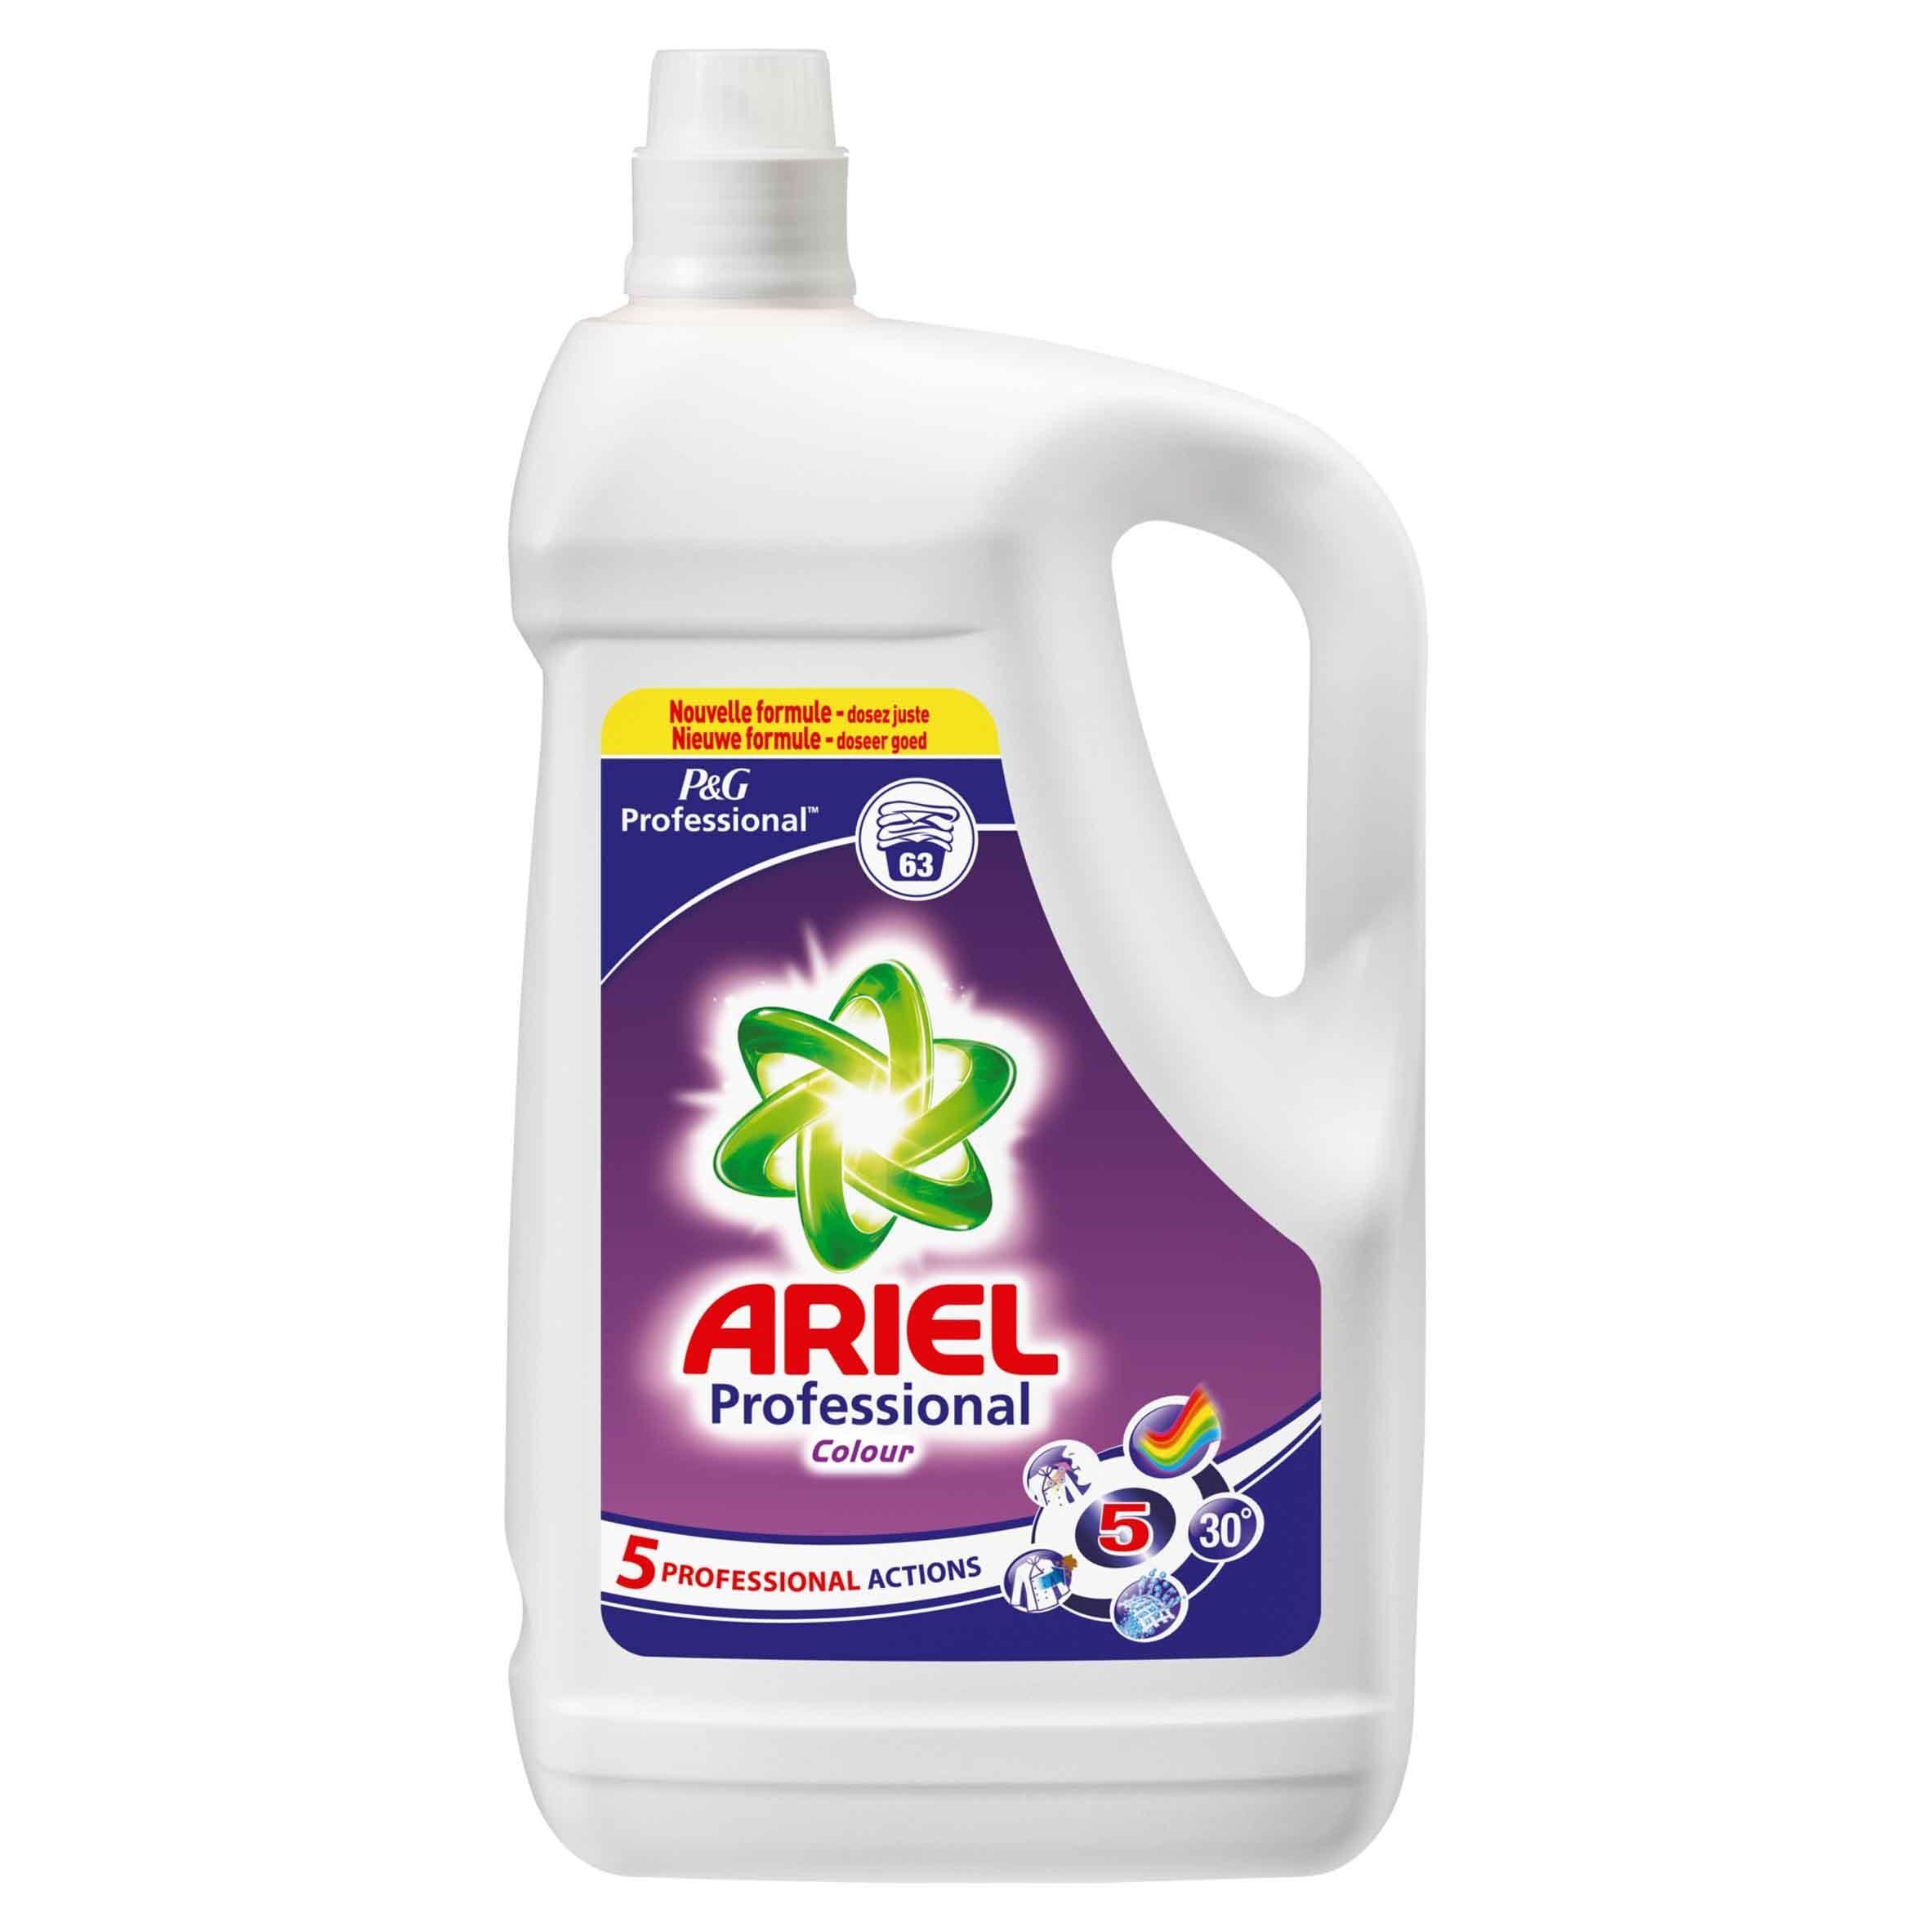 Ariel Color 70dos 5L vloeibaar wasmiddel P&G Professional